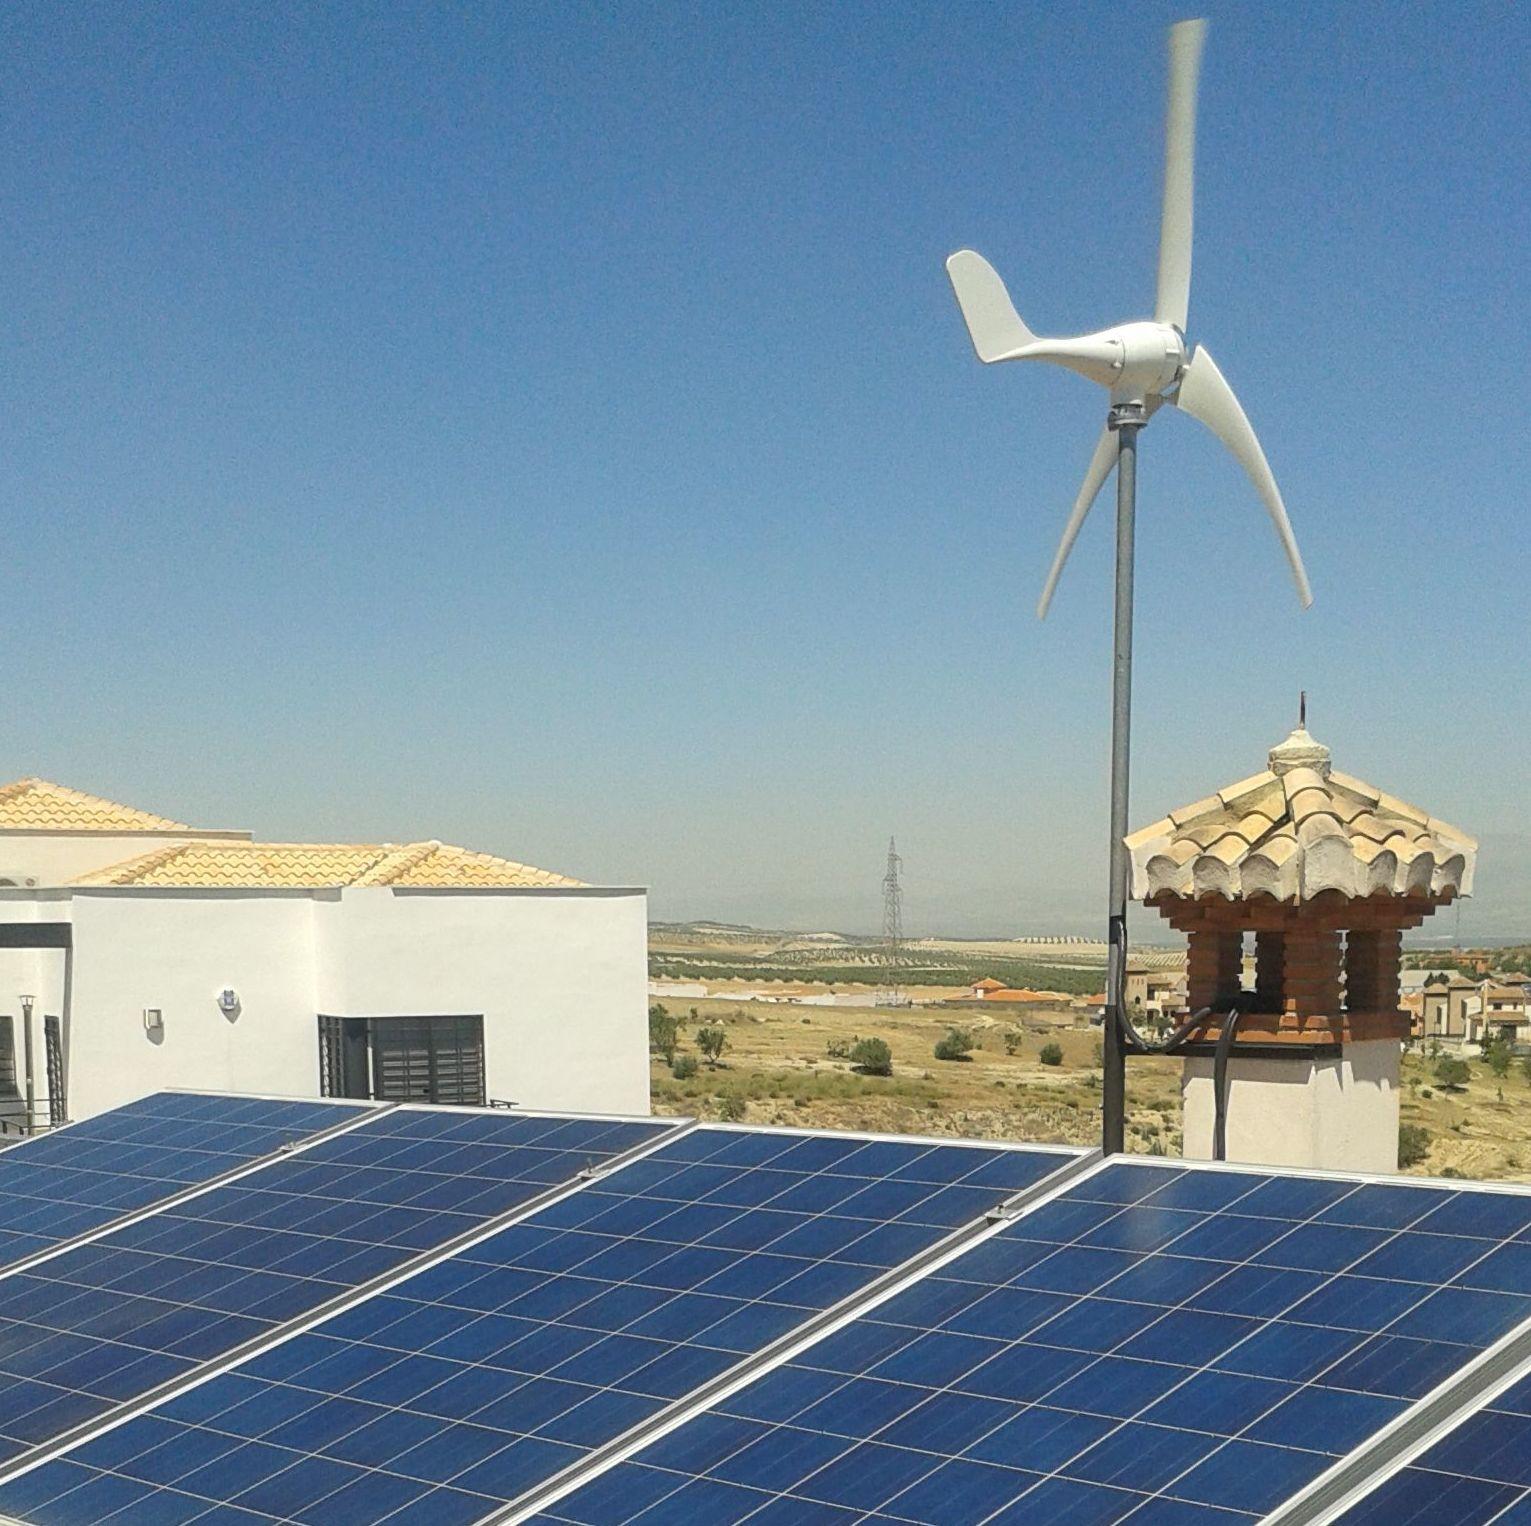 instalacion de fotovoltaica aislada mixta